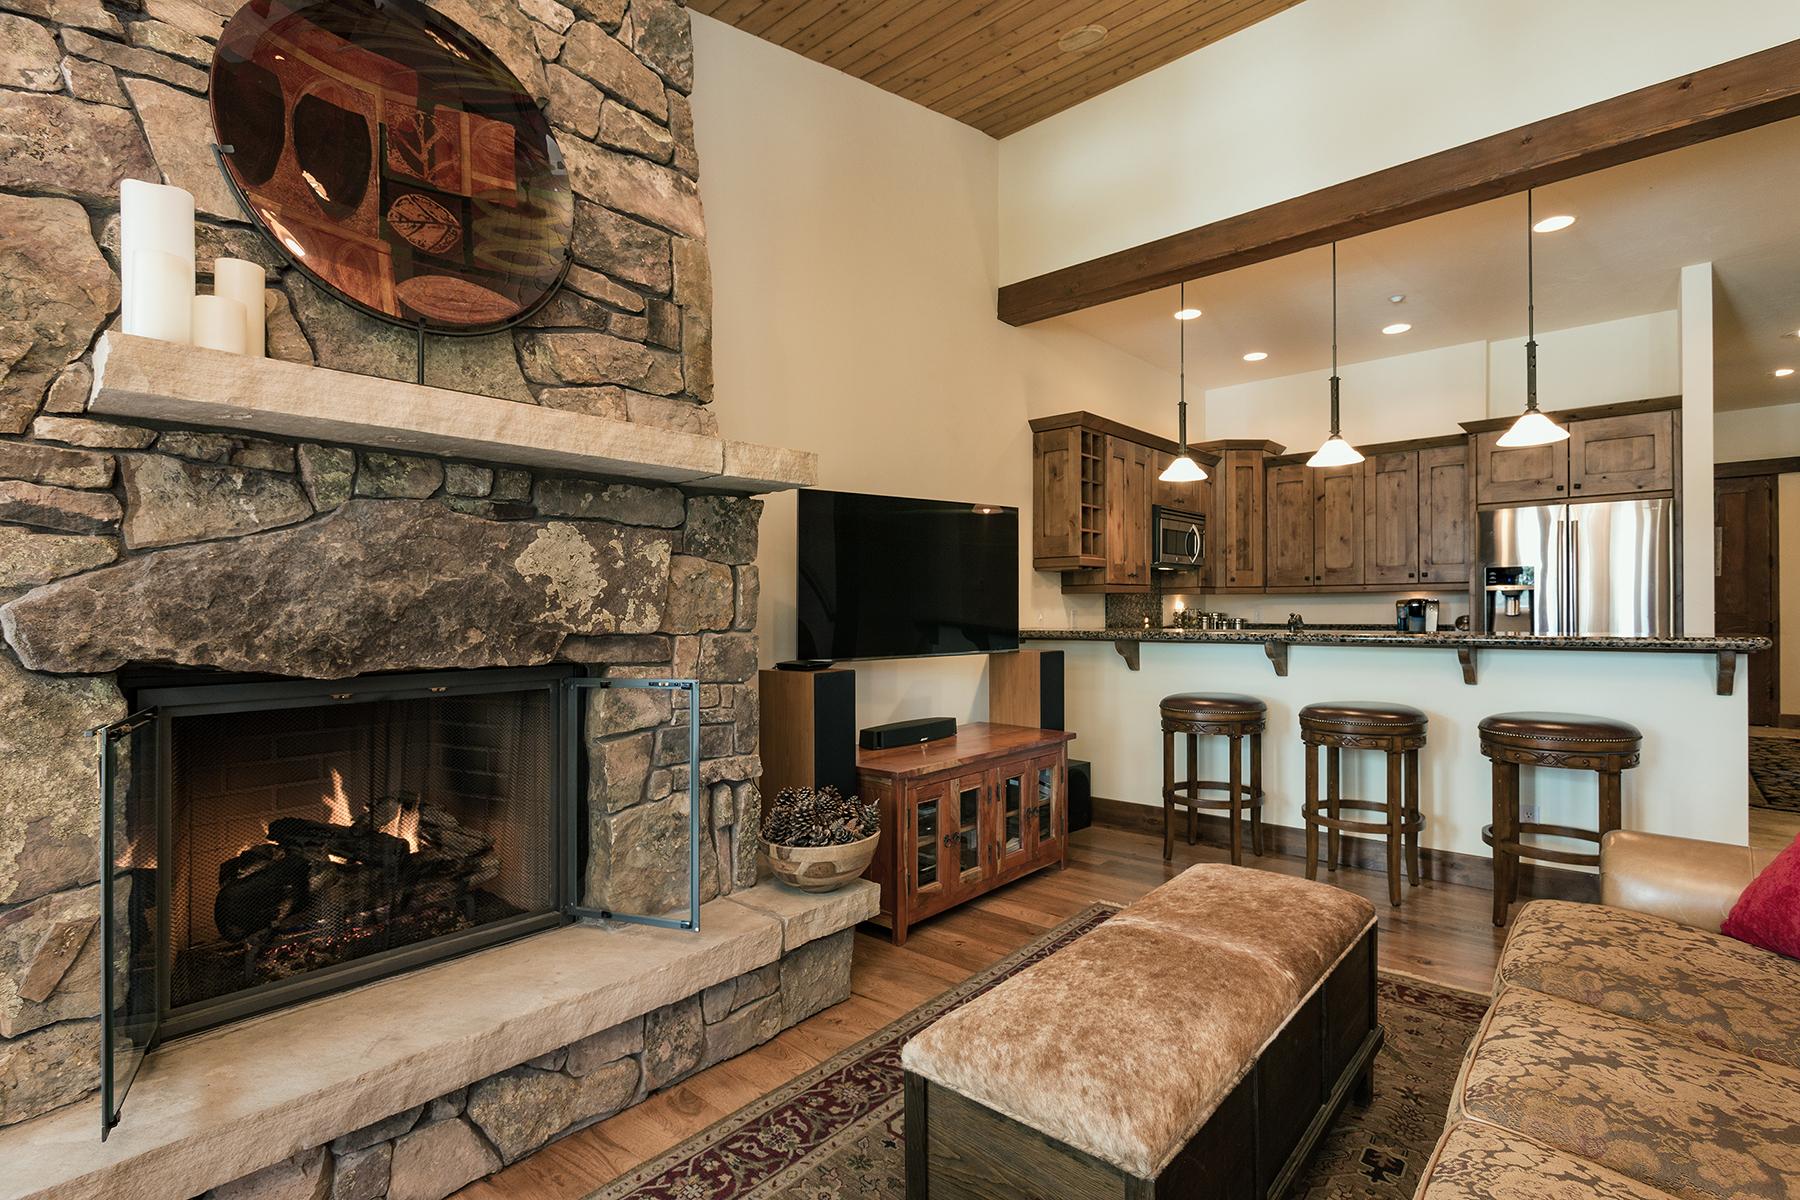 Additional photo for property listing at 590 Glacier Club Drive #3 590 Glacier Club Drive #3 Durango, Colorado 81301 United States